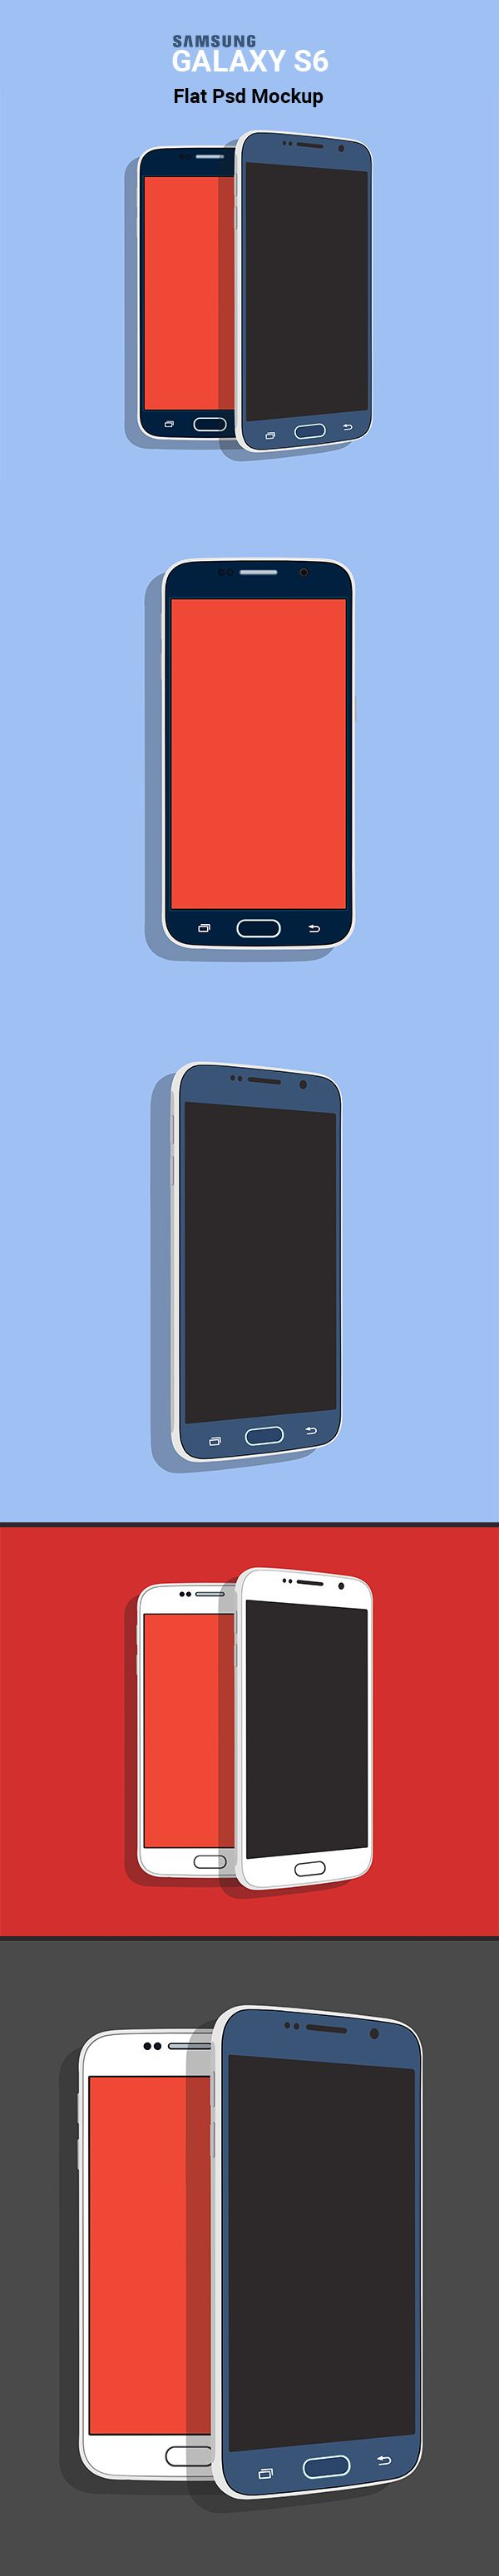 6 poster design photo mockups 57079 - 6 Poster Design Photo Mockups 57079 Samsung Galaxy S6 Flat Psd Mockup Main